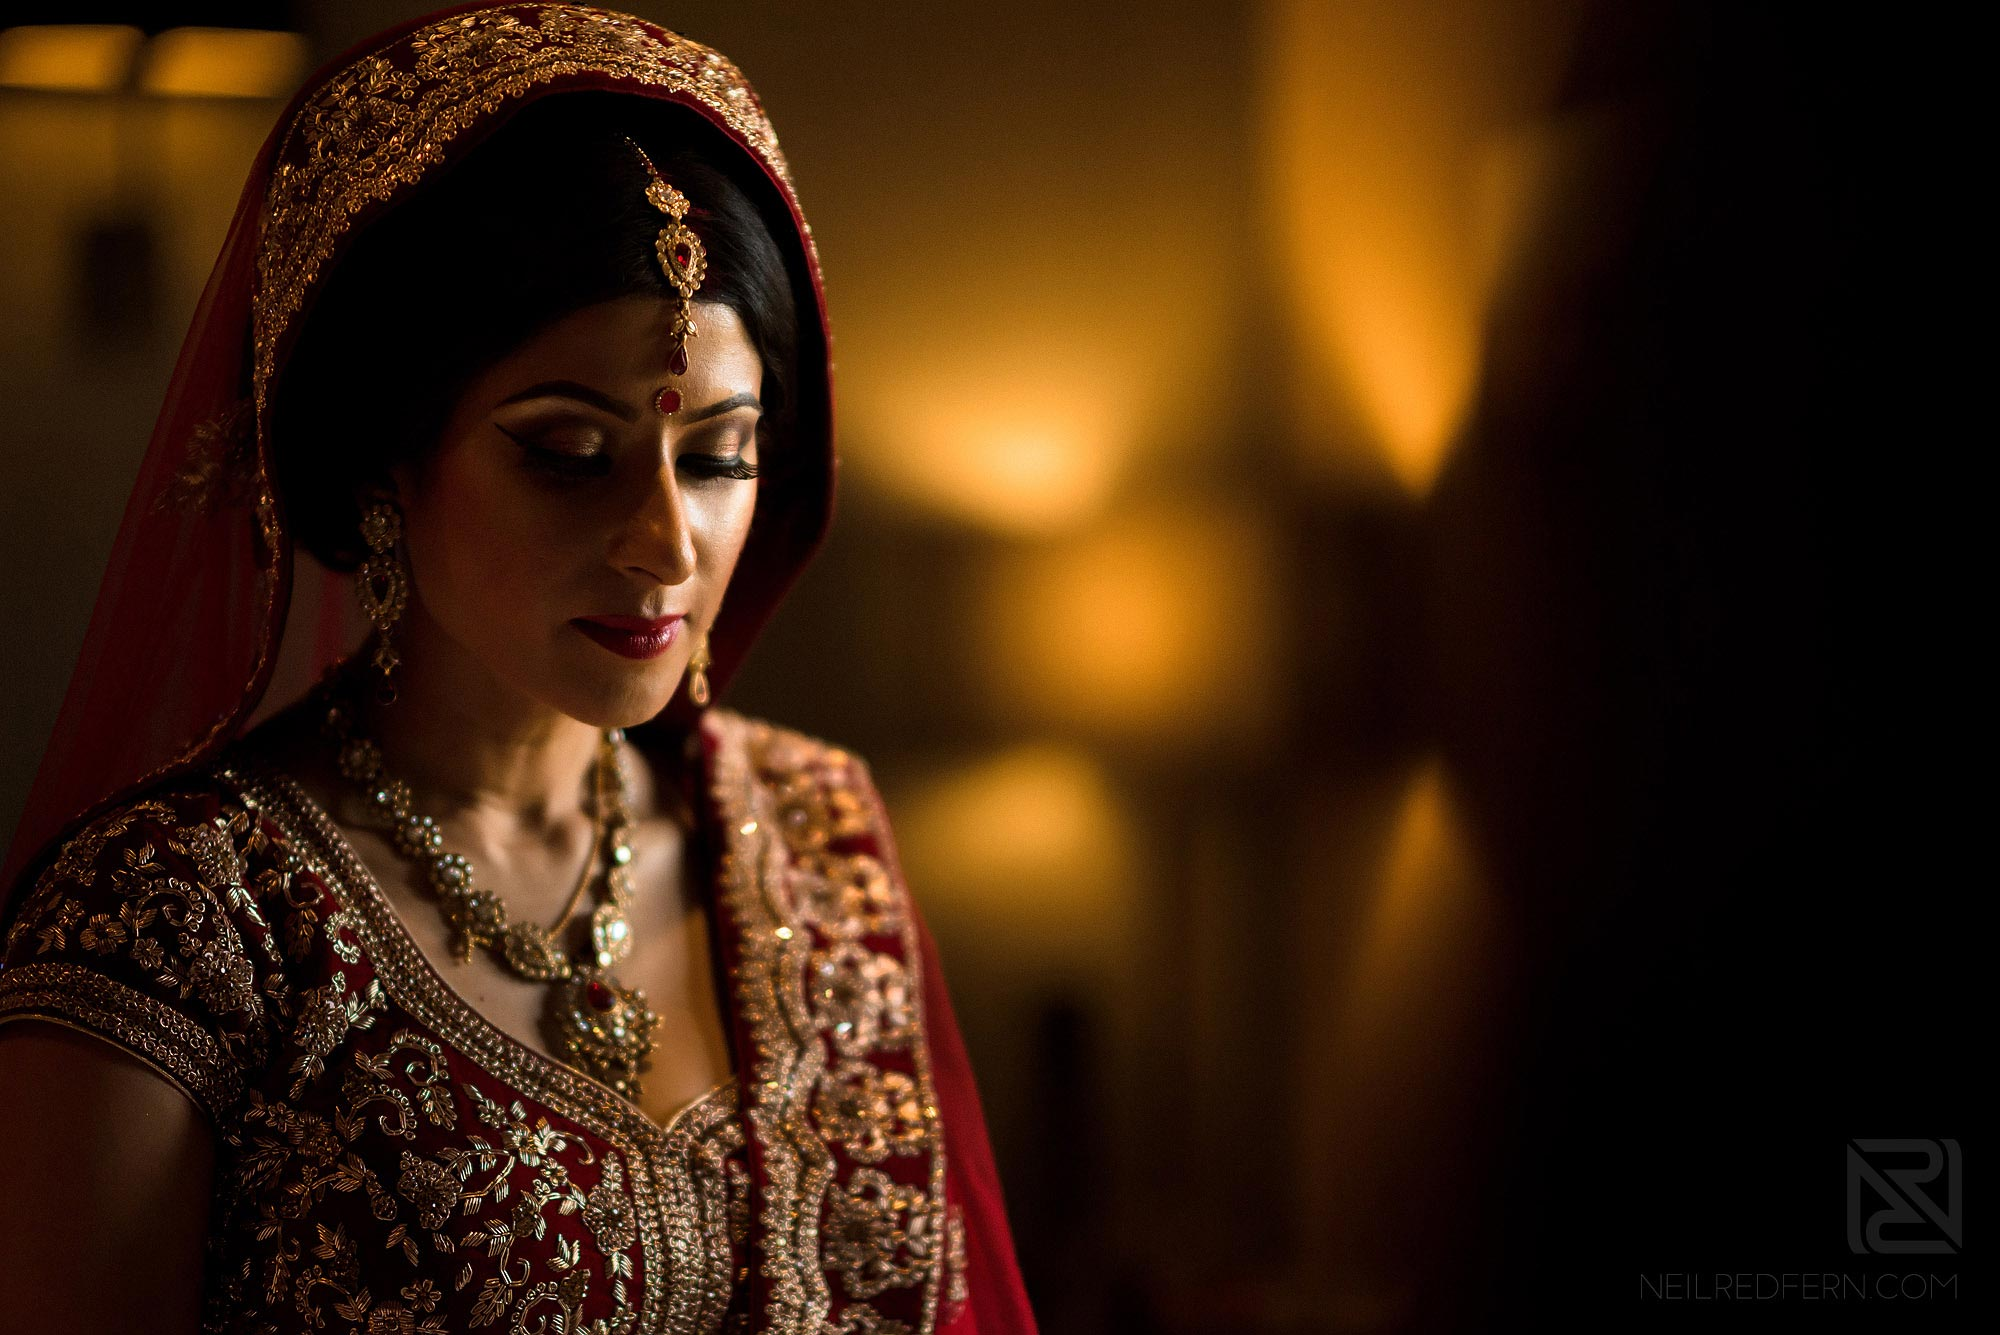 portrait of beautiful Indian bride